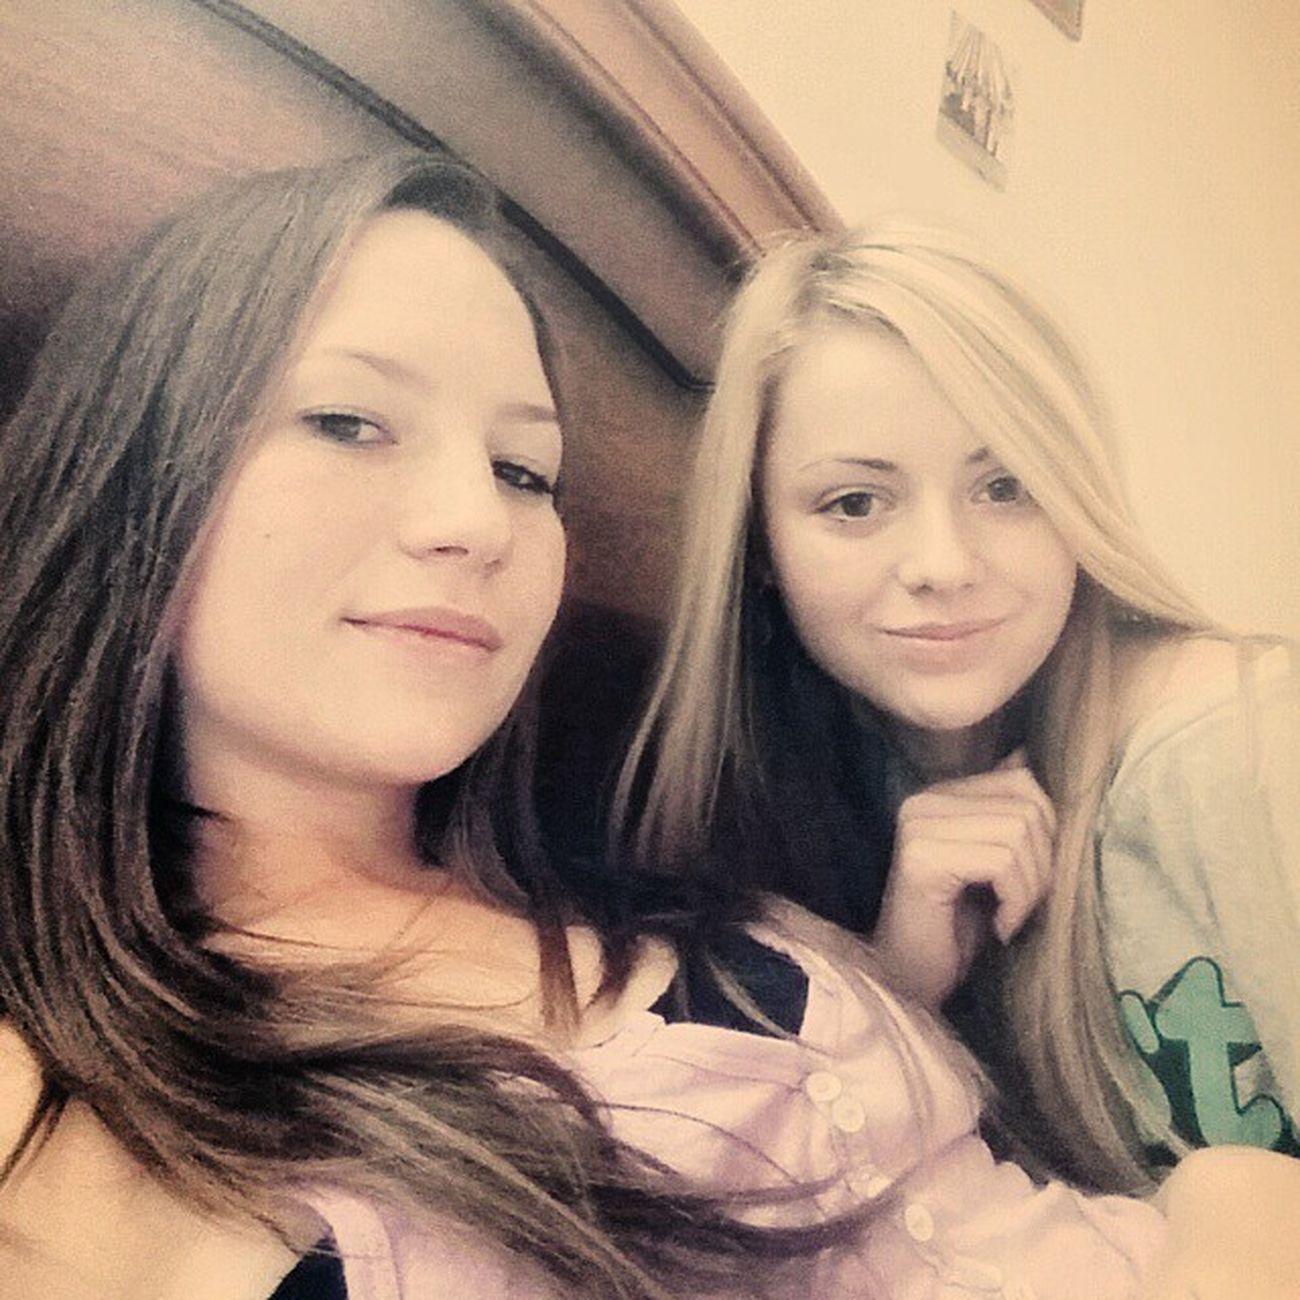 Blond Bff Russiangirlsss_ Sisters cute morning Nastya Vika בוקר טוב❤